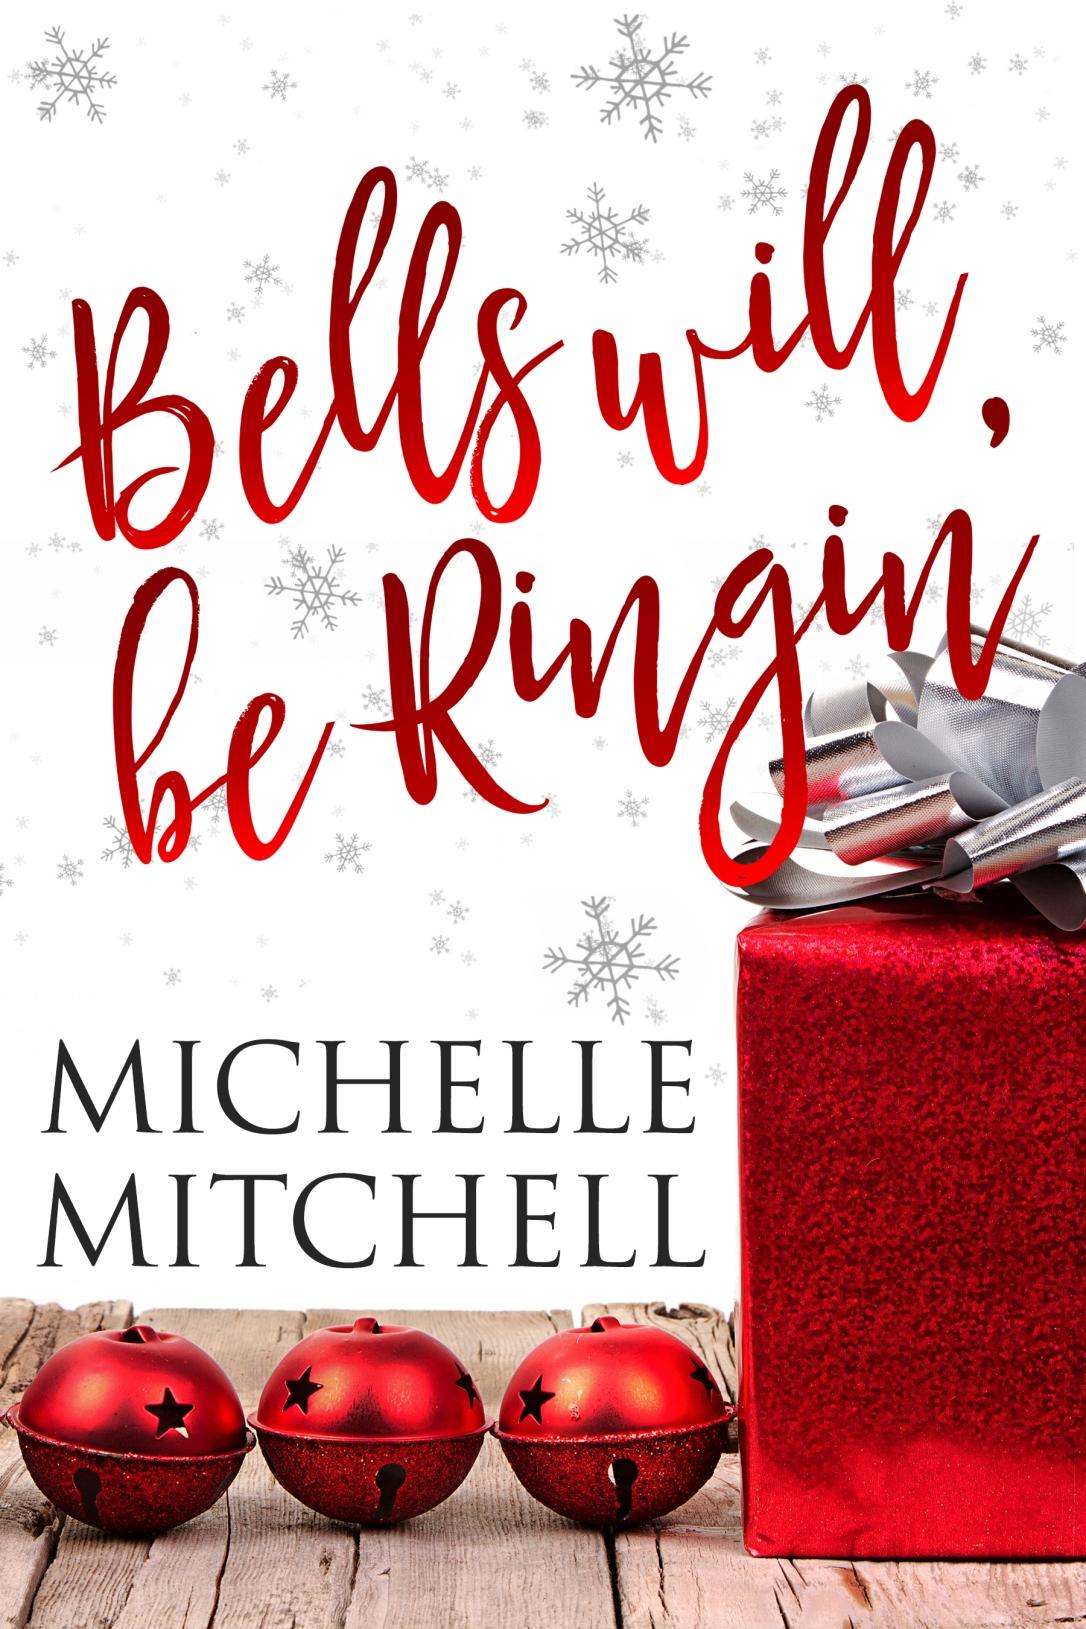 MichelleMitchell_BellsWillBeRingin_ECoverB (2).jpg